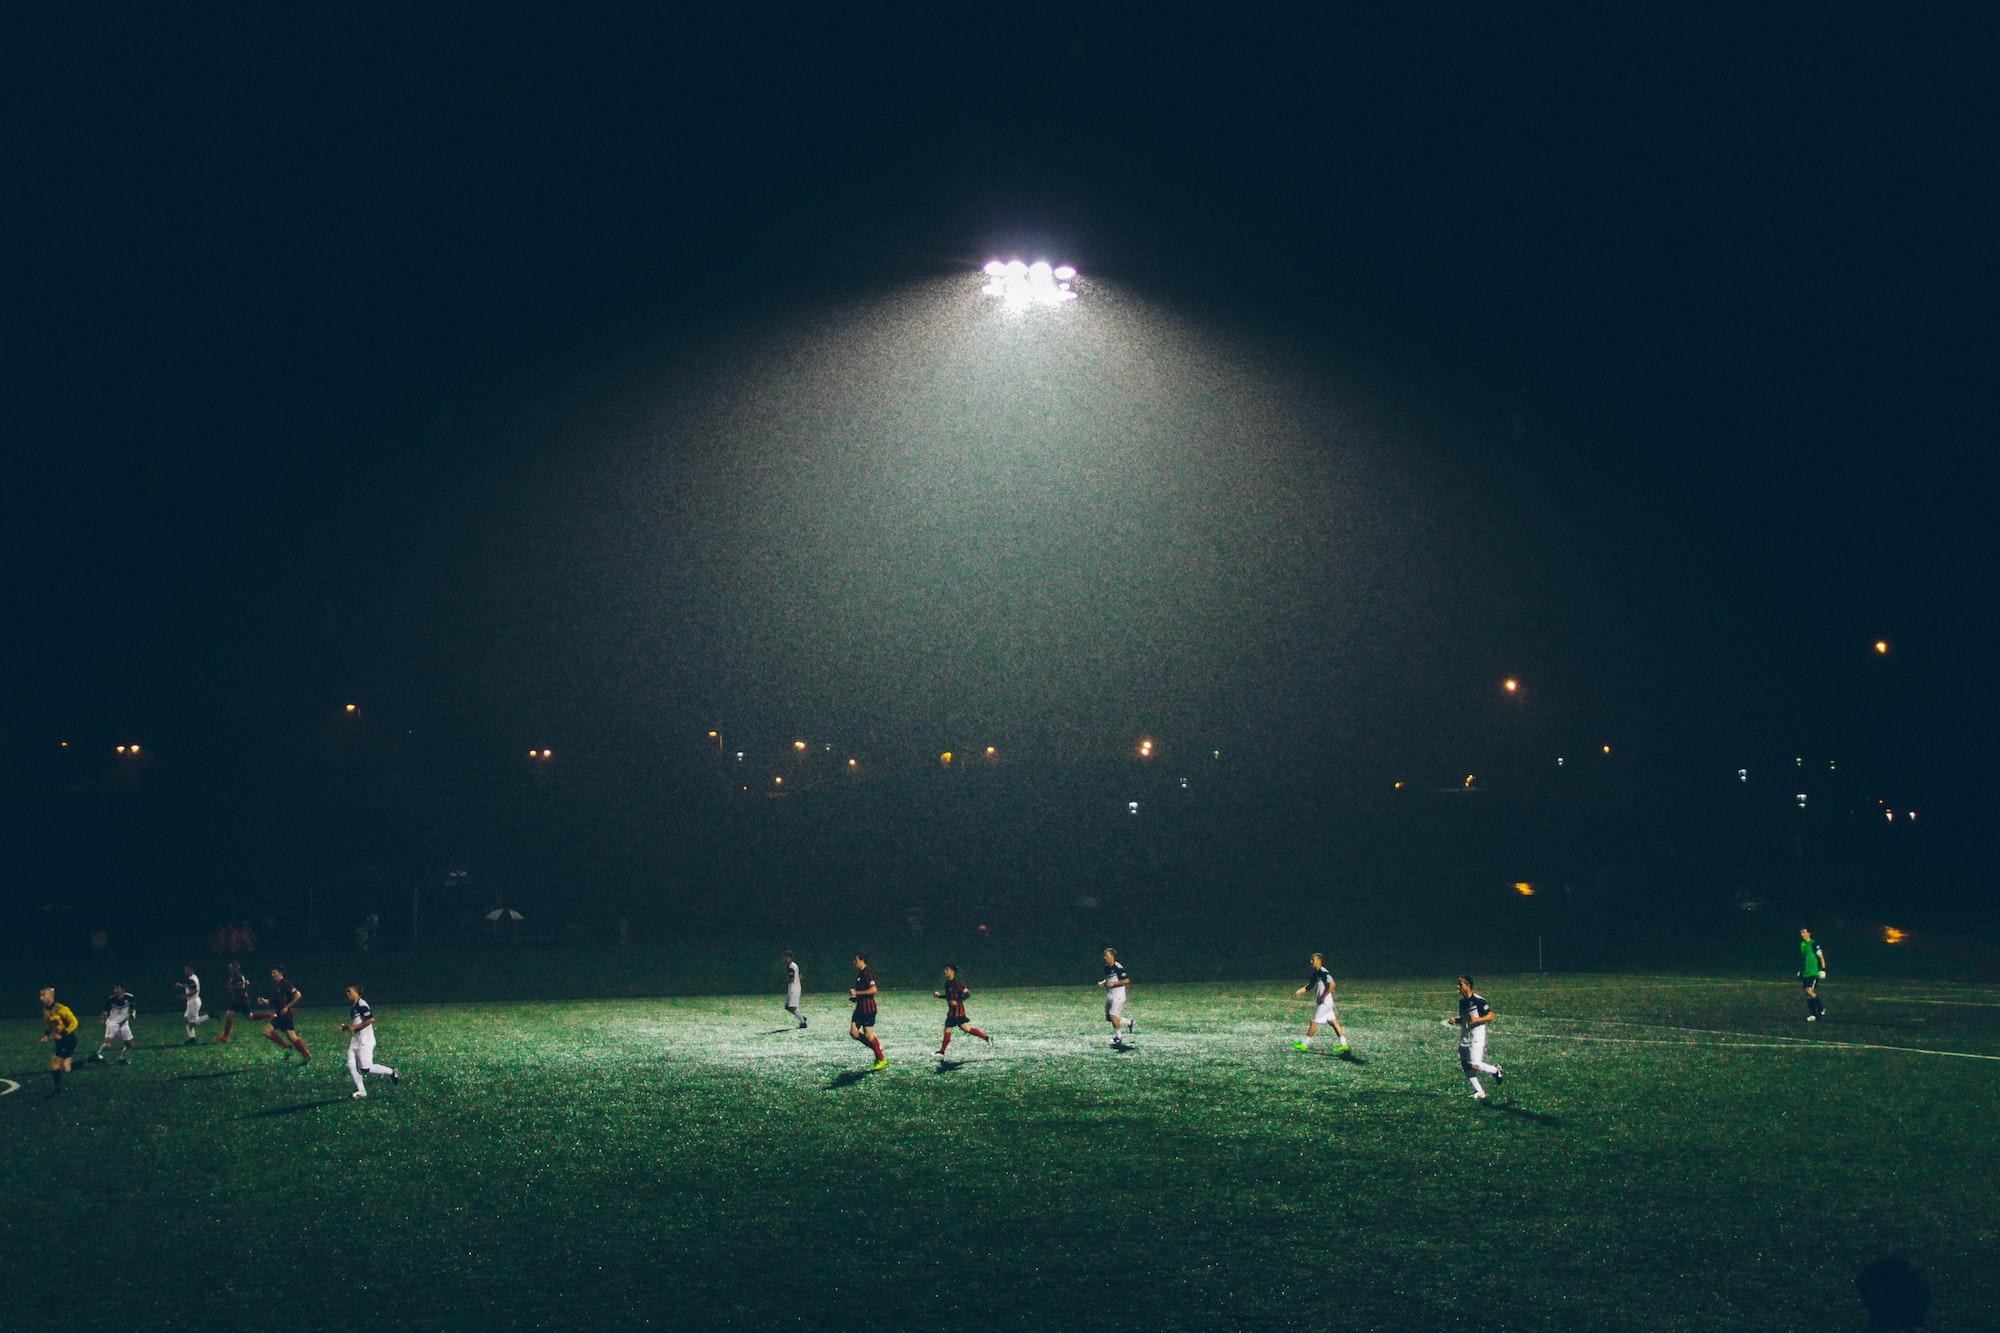 Quote e pronostico vincente Conference League 2021-22